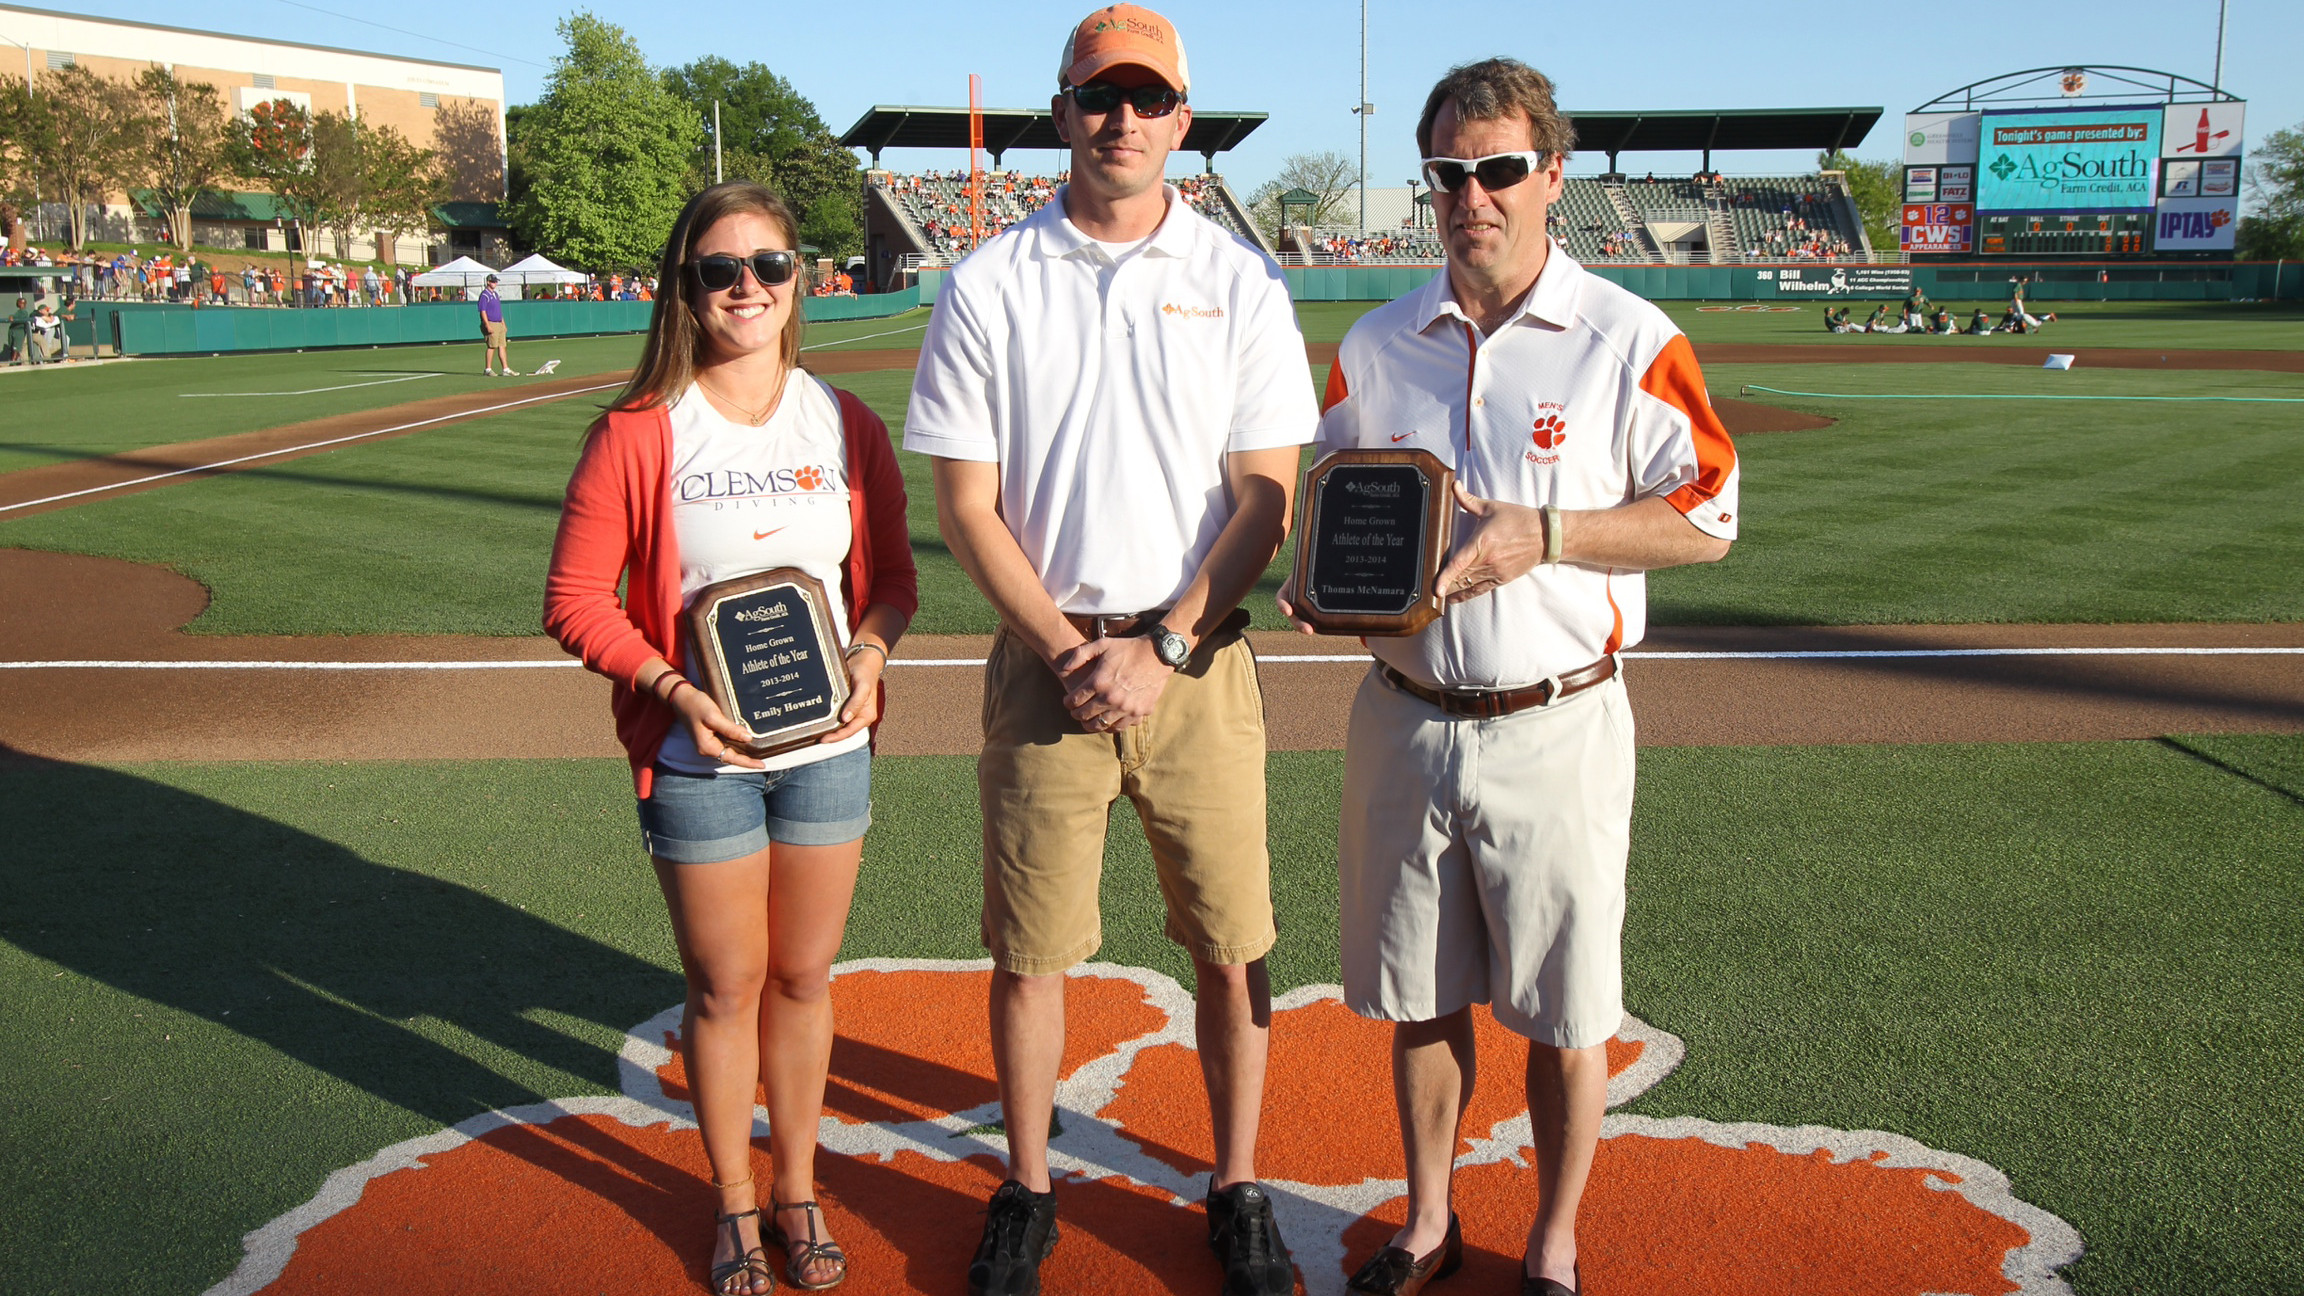 Howard & McNamara Named AgSouth Student-Athletes of the Year